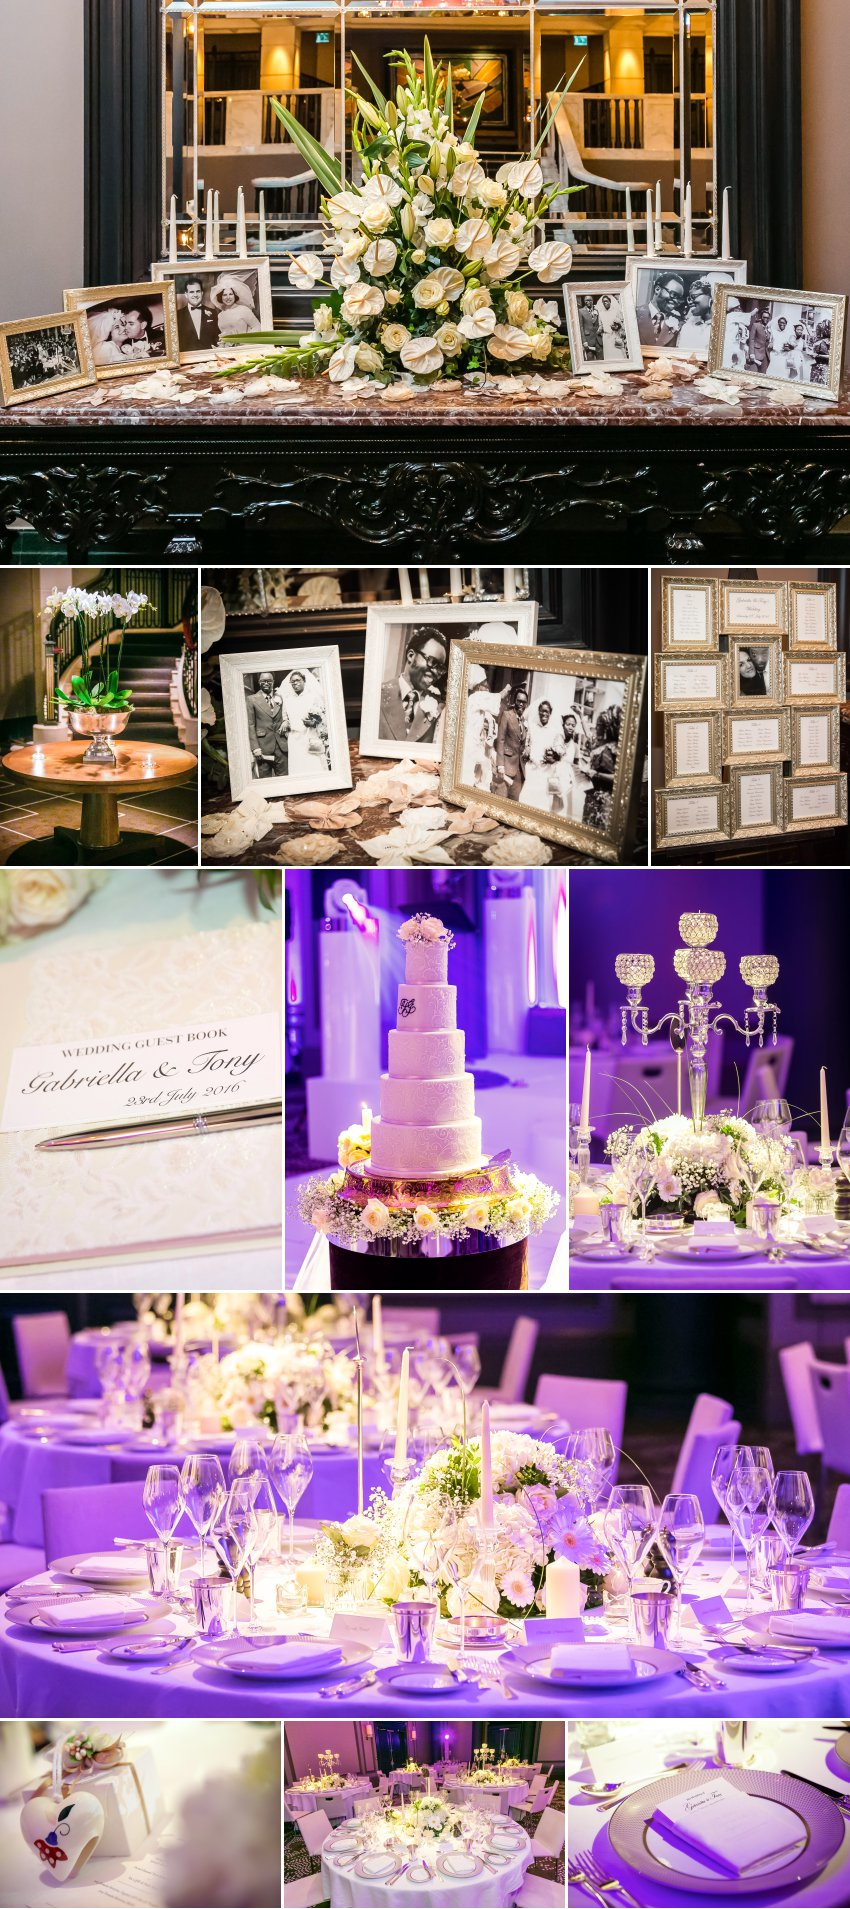 17 Nigerian wedding at Rosewood Hotel